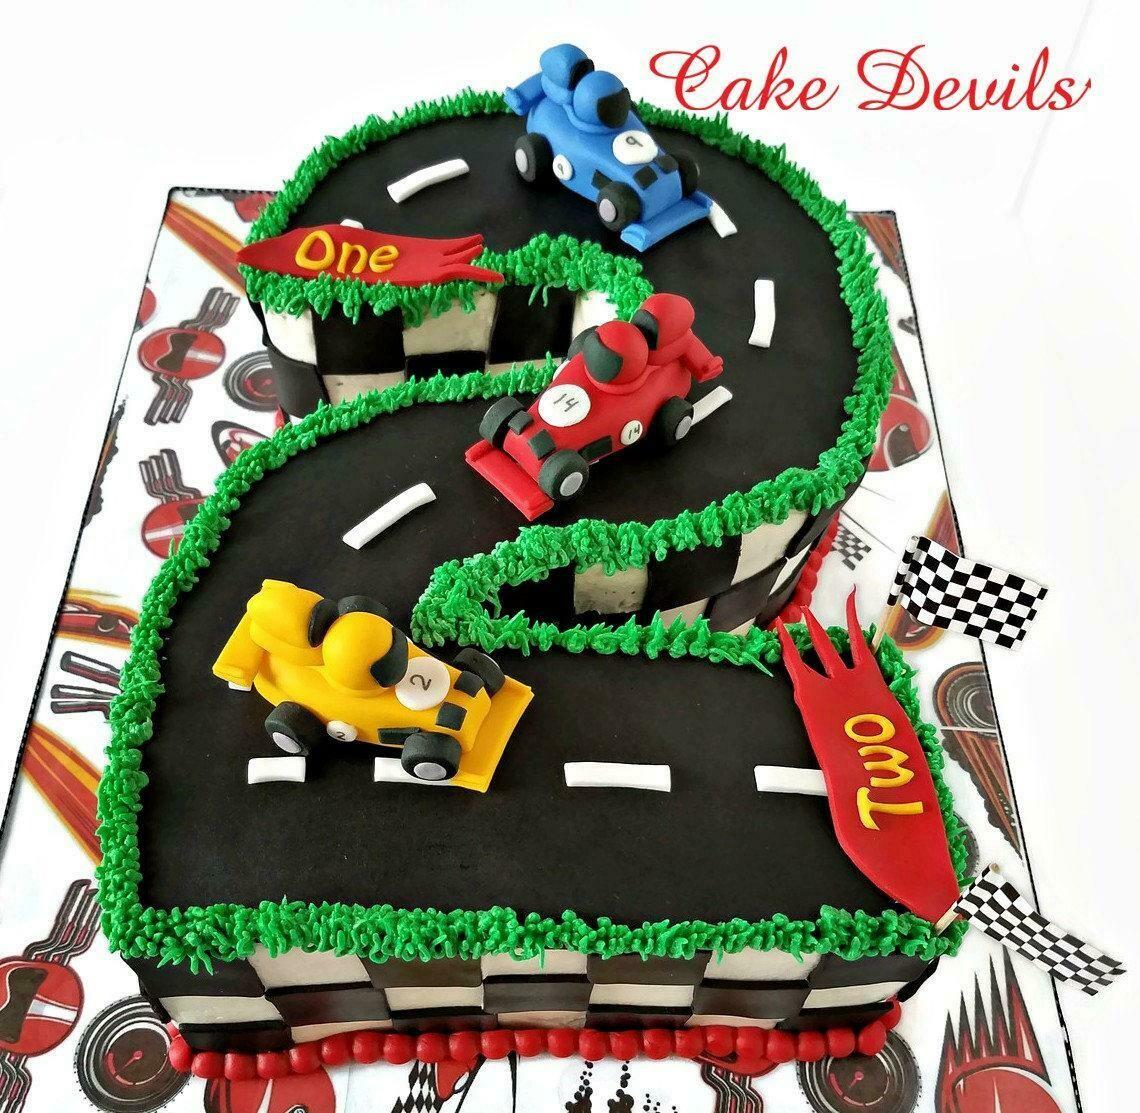 Mini Race Car Fondant Cake Toppers, Handmade Sports Car Cake Decorations for Birthday Cake